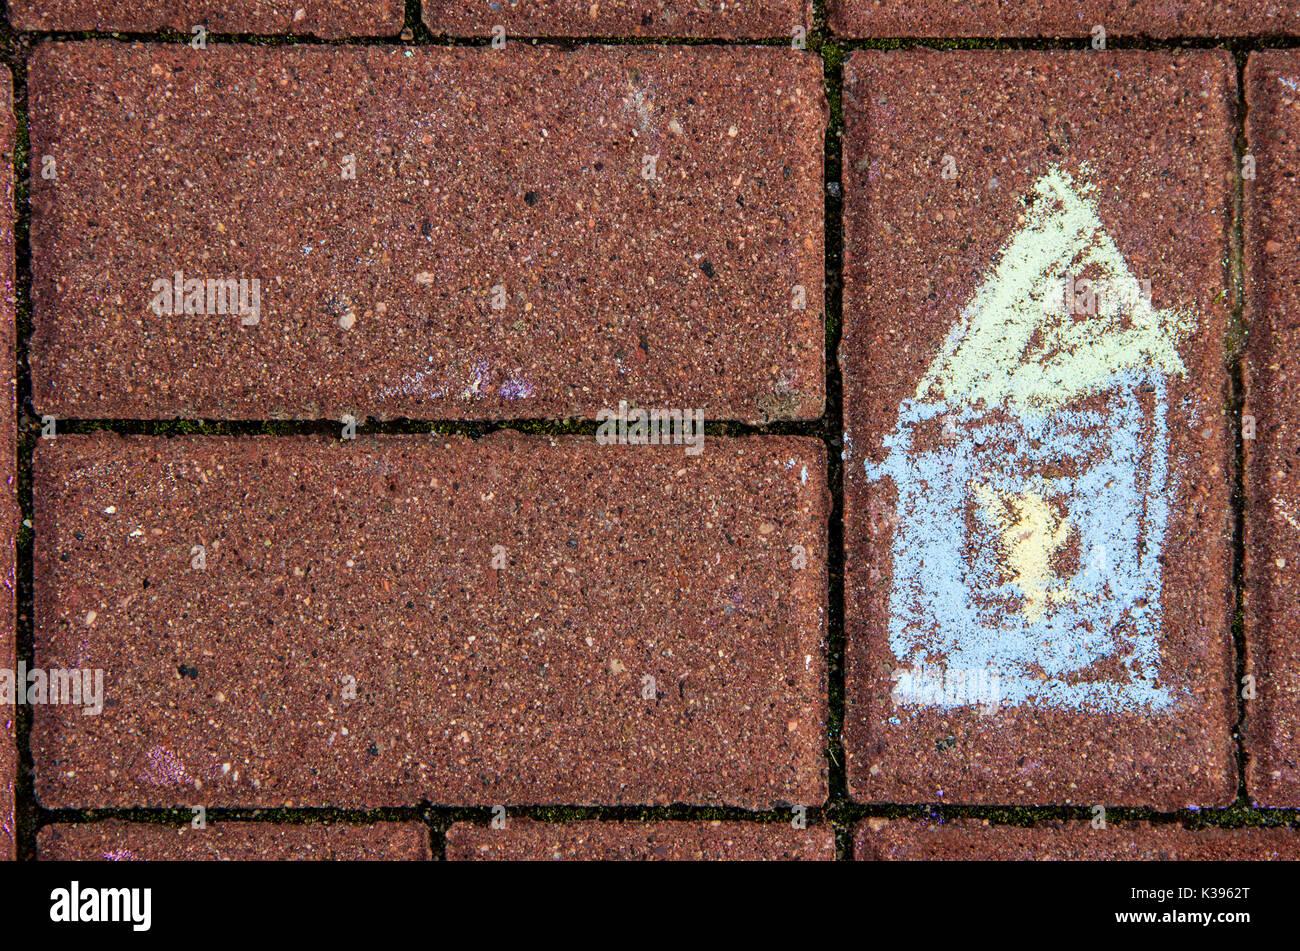 Childish chalk drawing of a house on a brick pavement - Stock Image